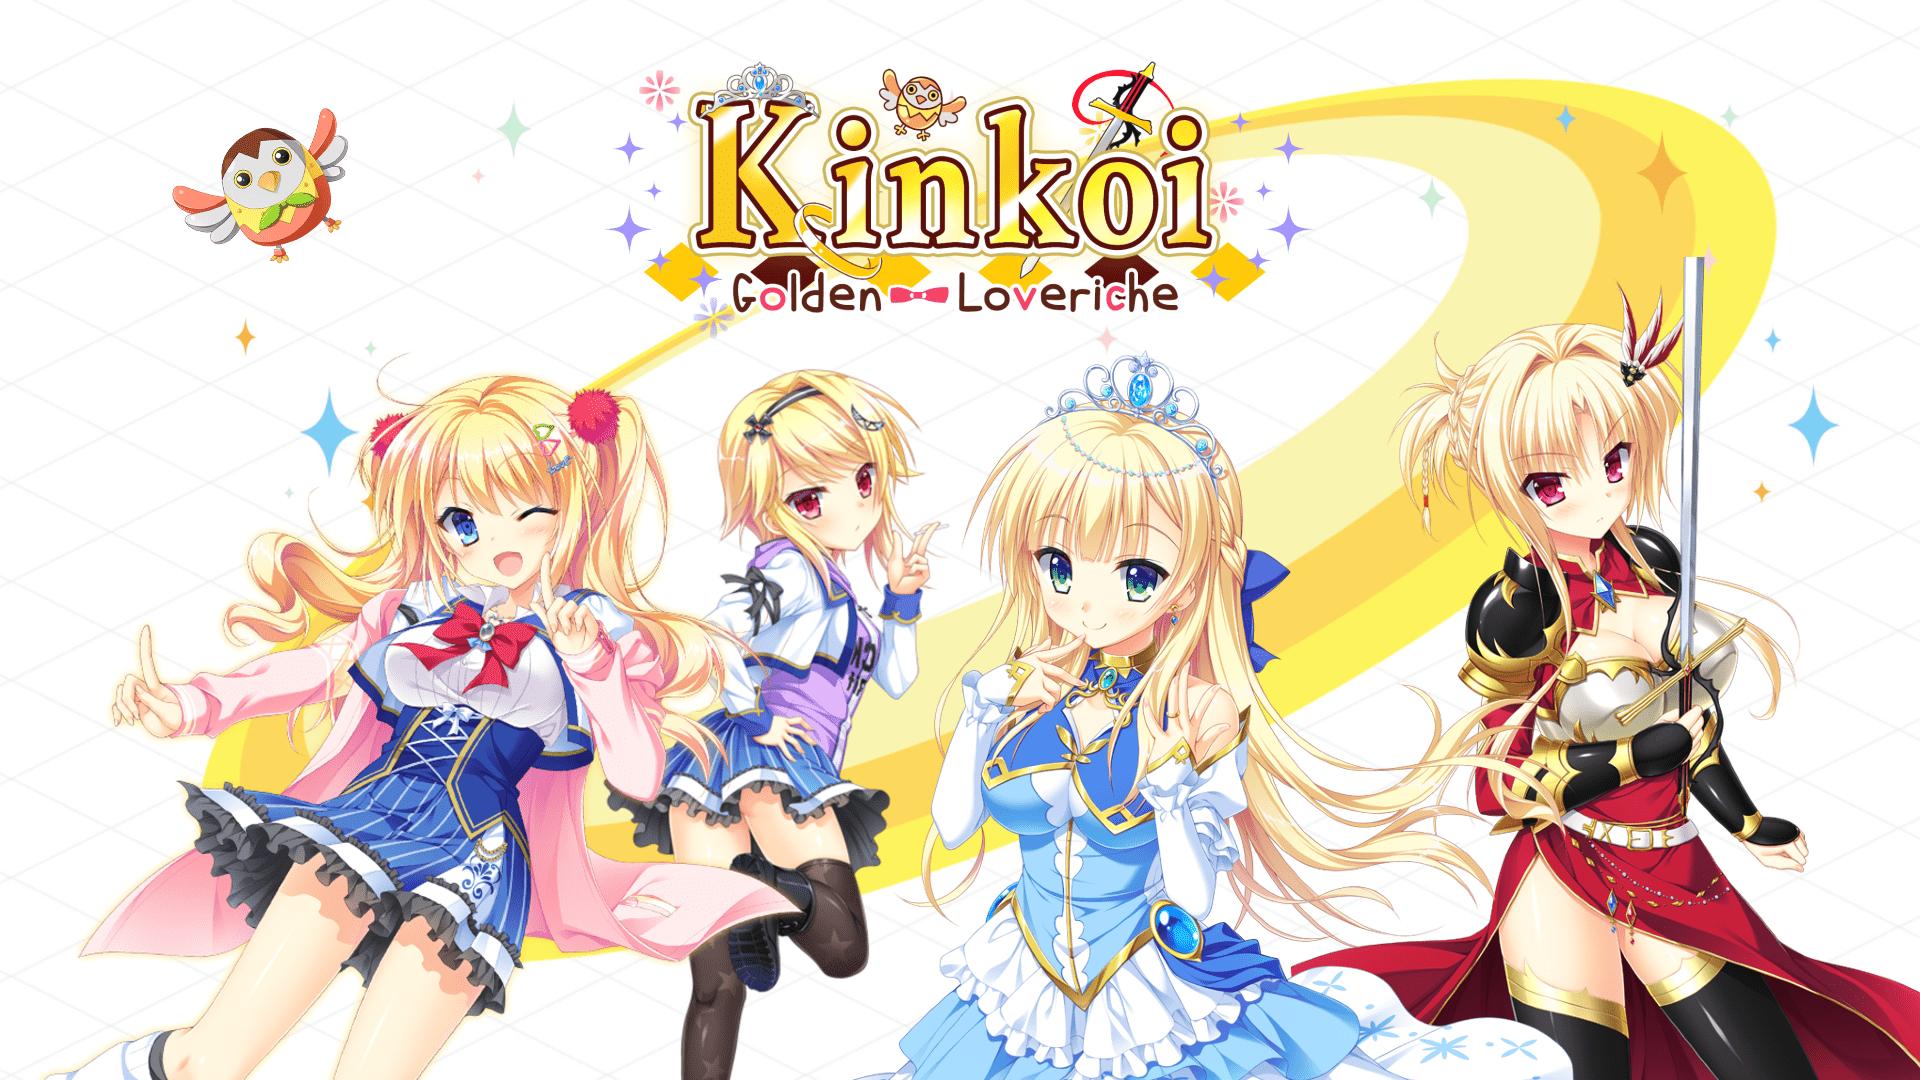 Kinkoi Golden Loveriche Free Download